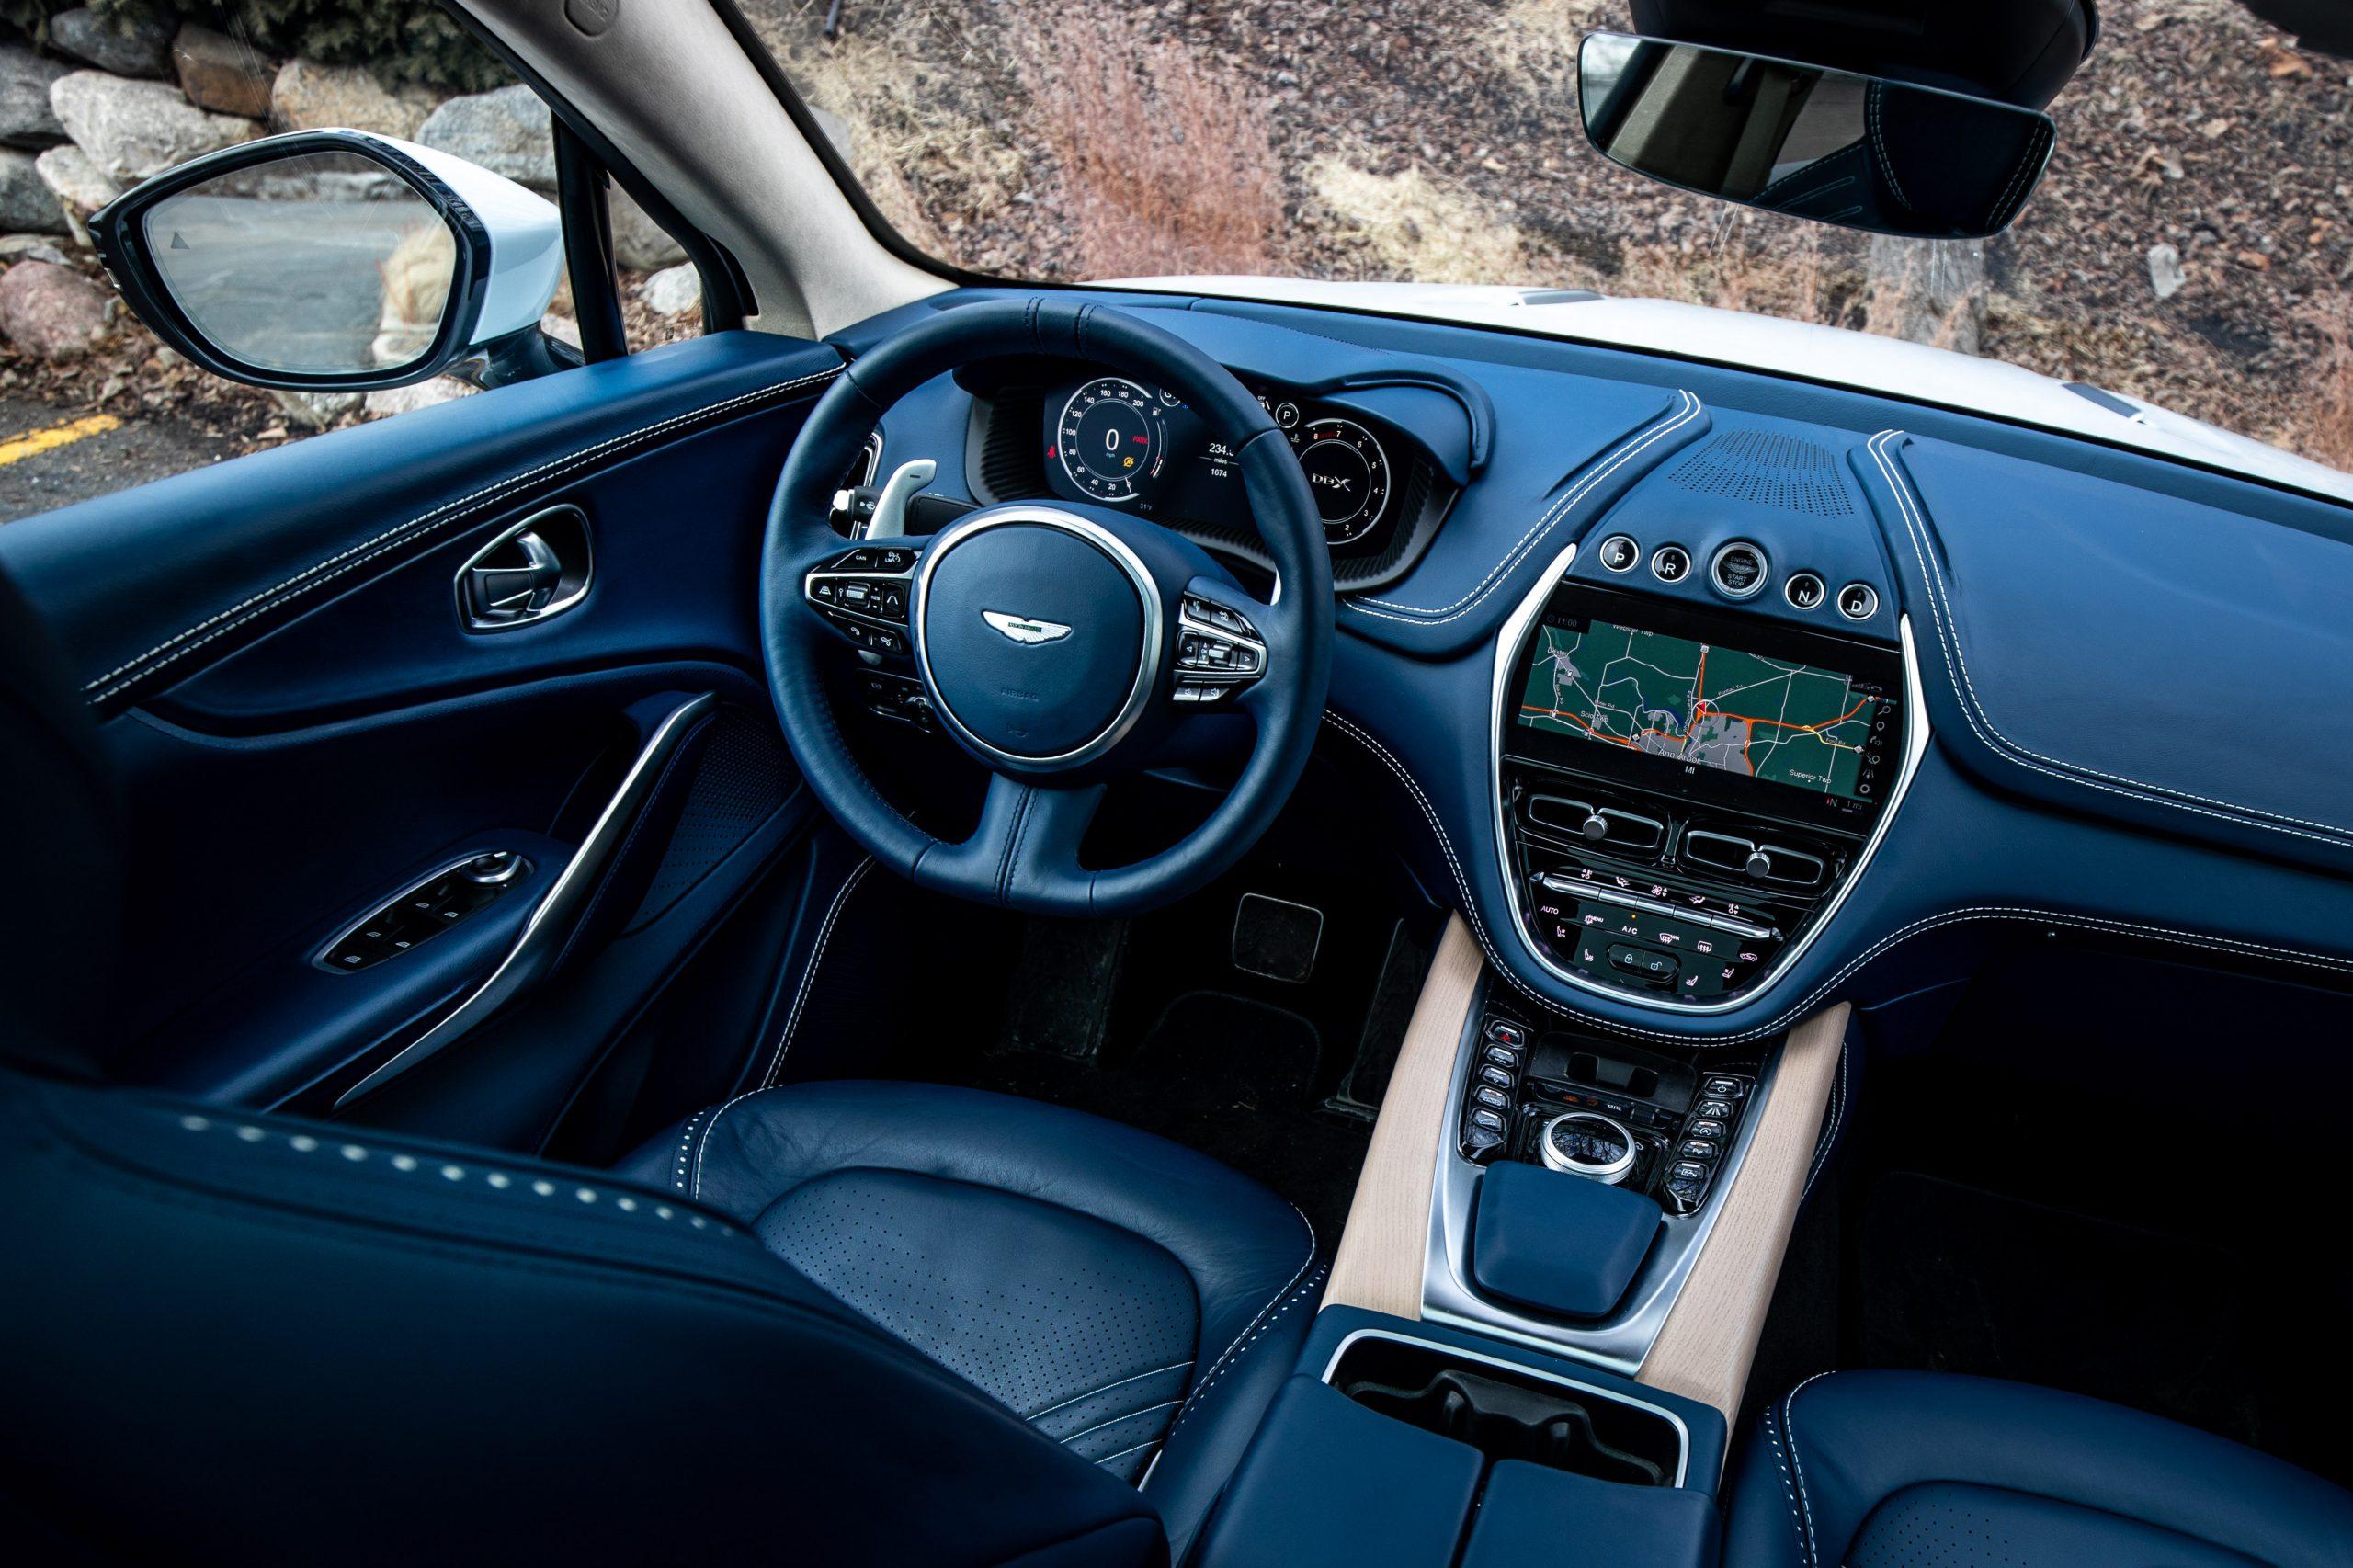 2021 Aston Martin DBX interior drivers seat